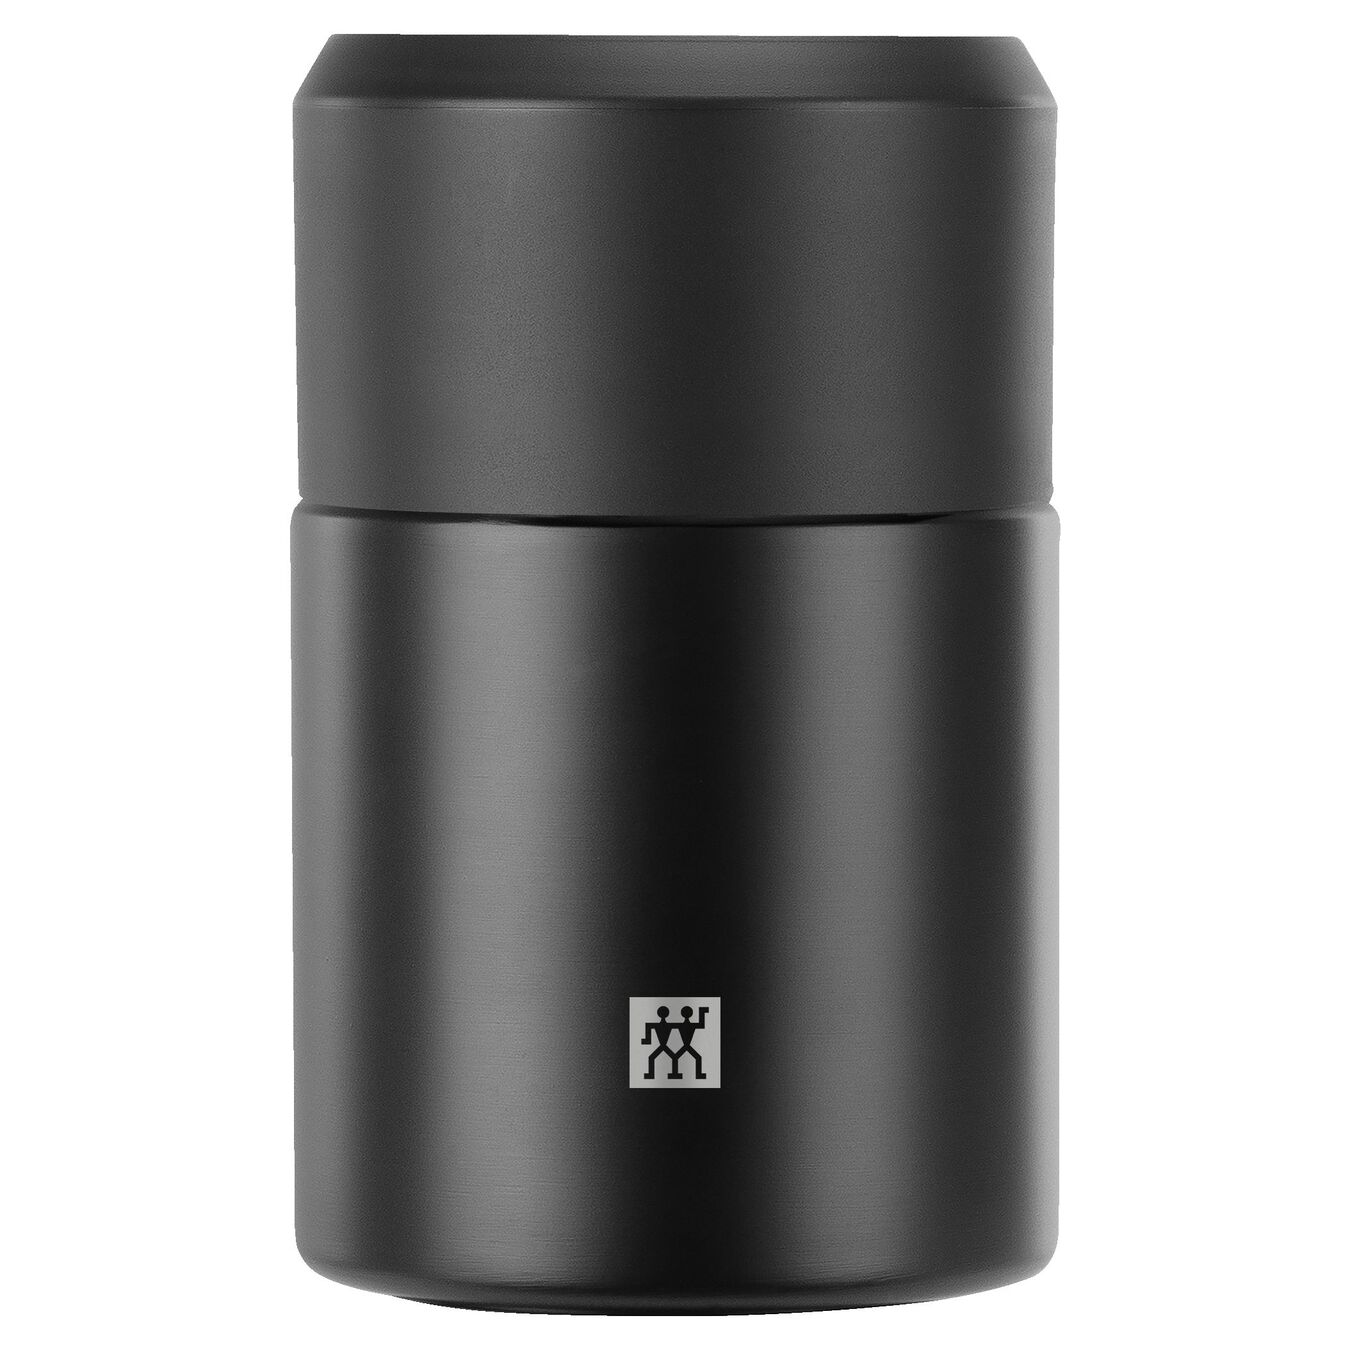 Food jar, black | Stainless steel | 700 ml,,large 1